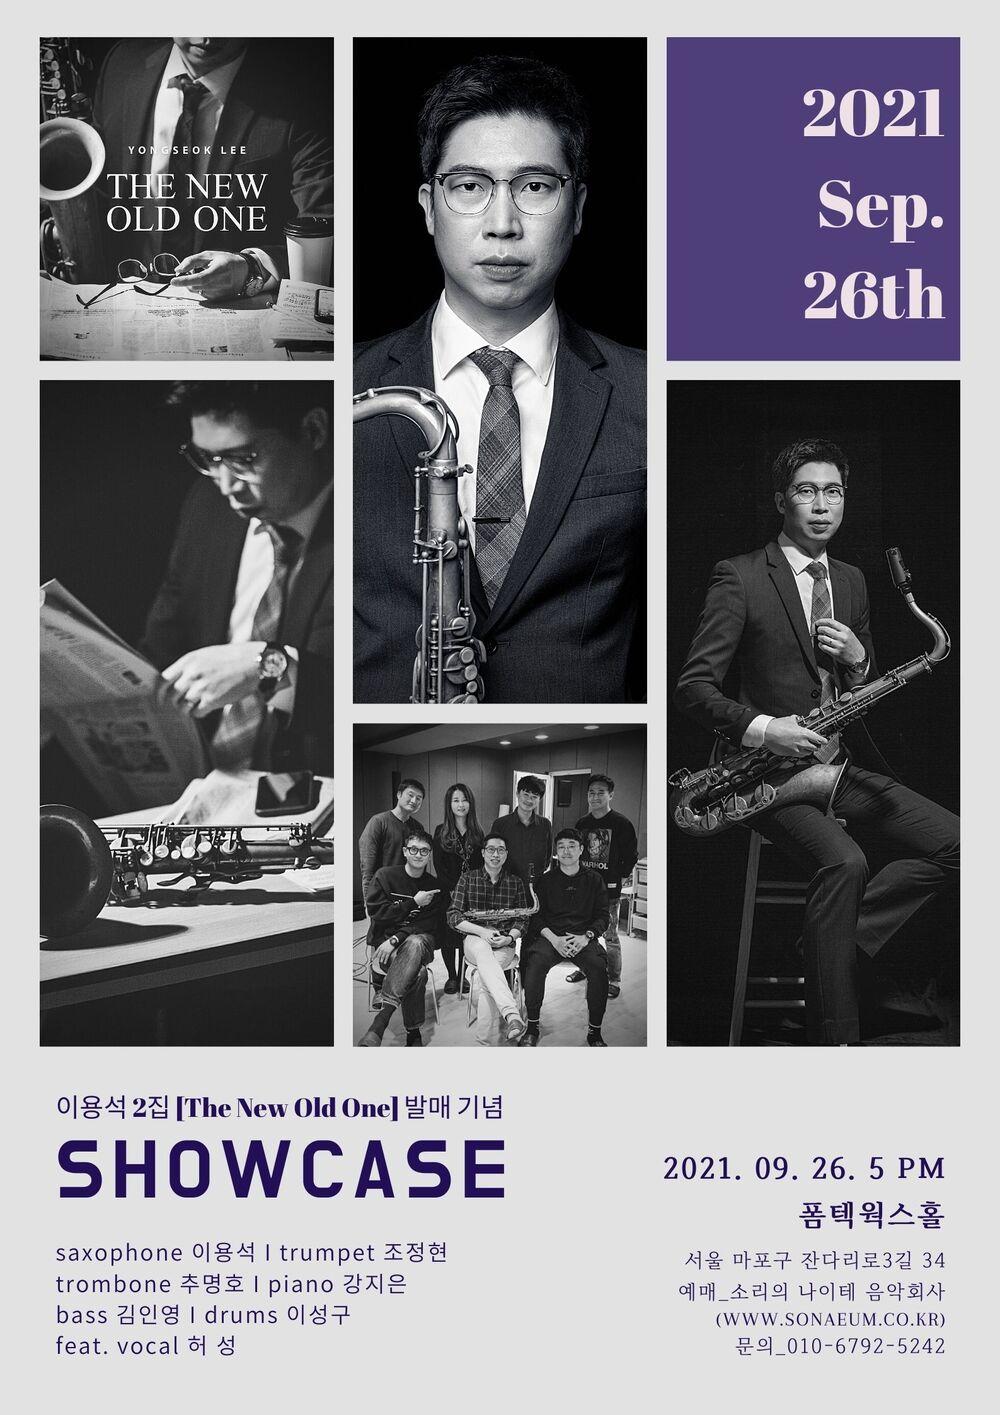 showcase(jpg).JPG